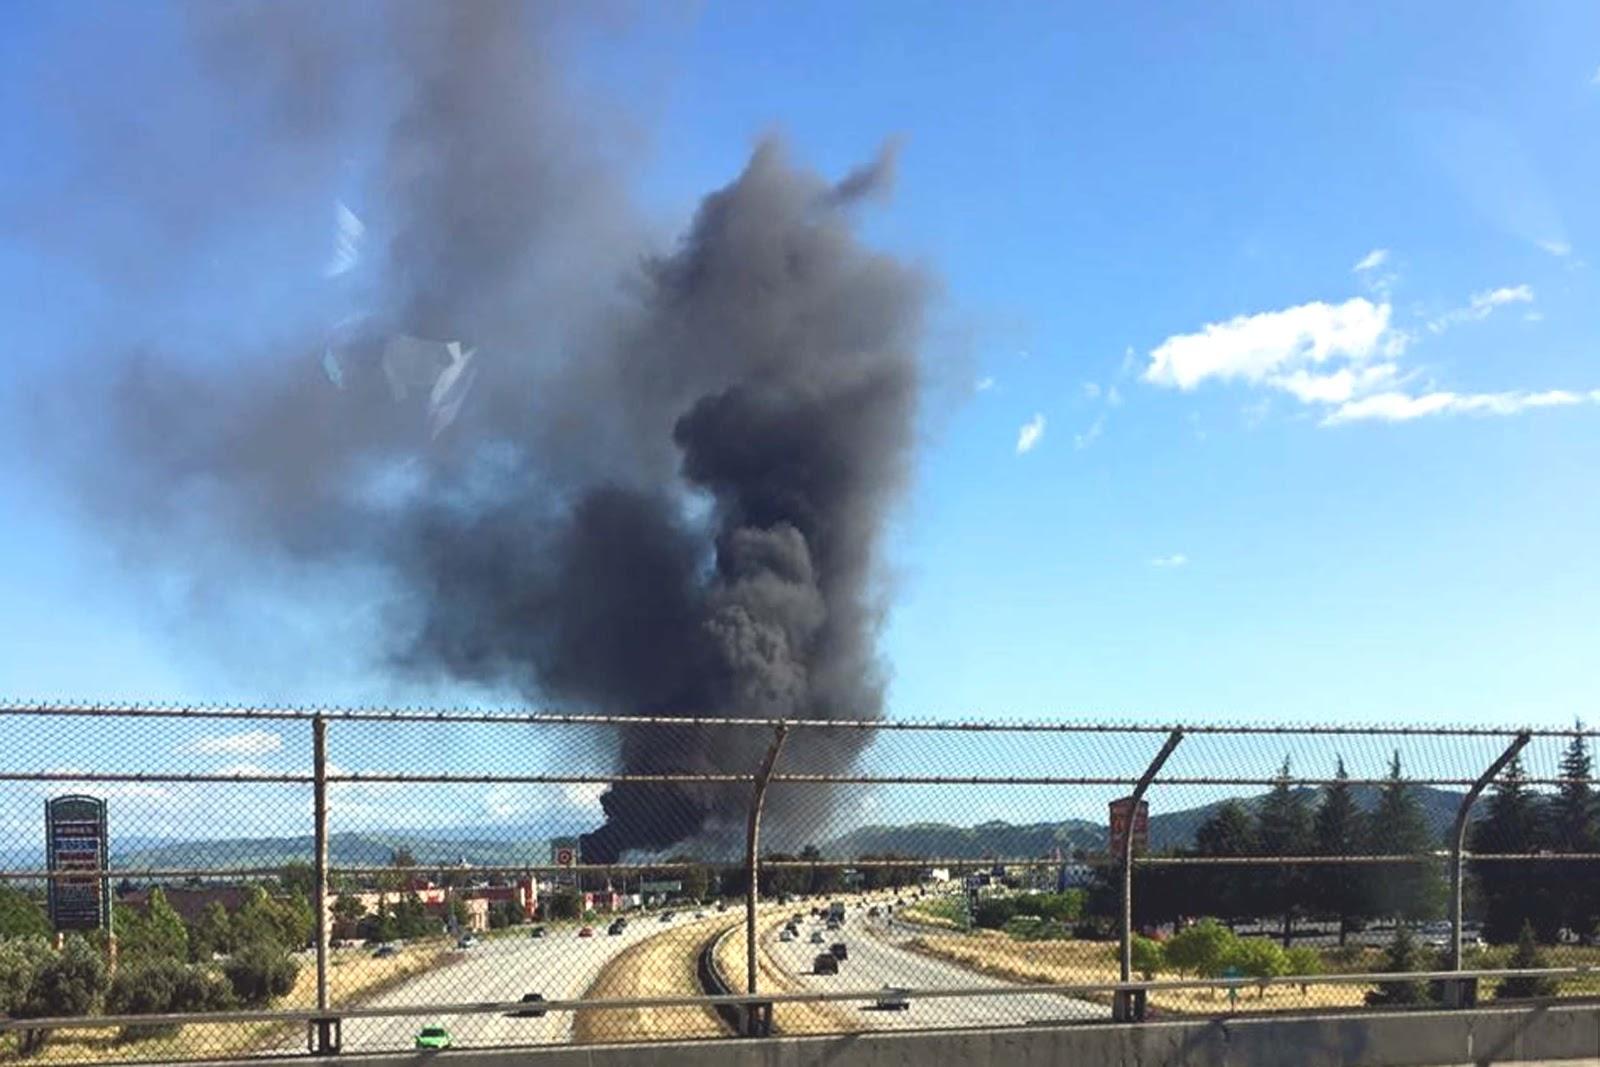 Fire Associates Of Santa Clara Valley Smokey Fire In Gilroy Brings 3 Alarm Response